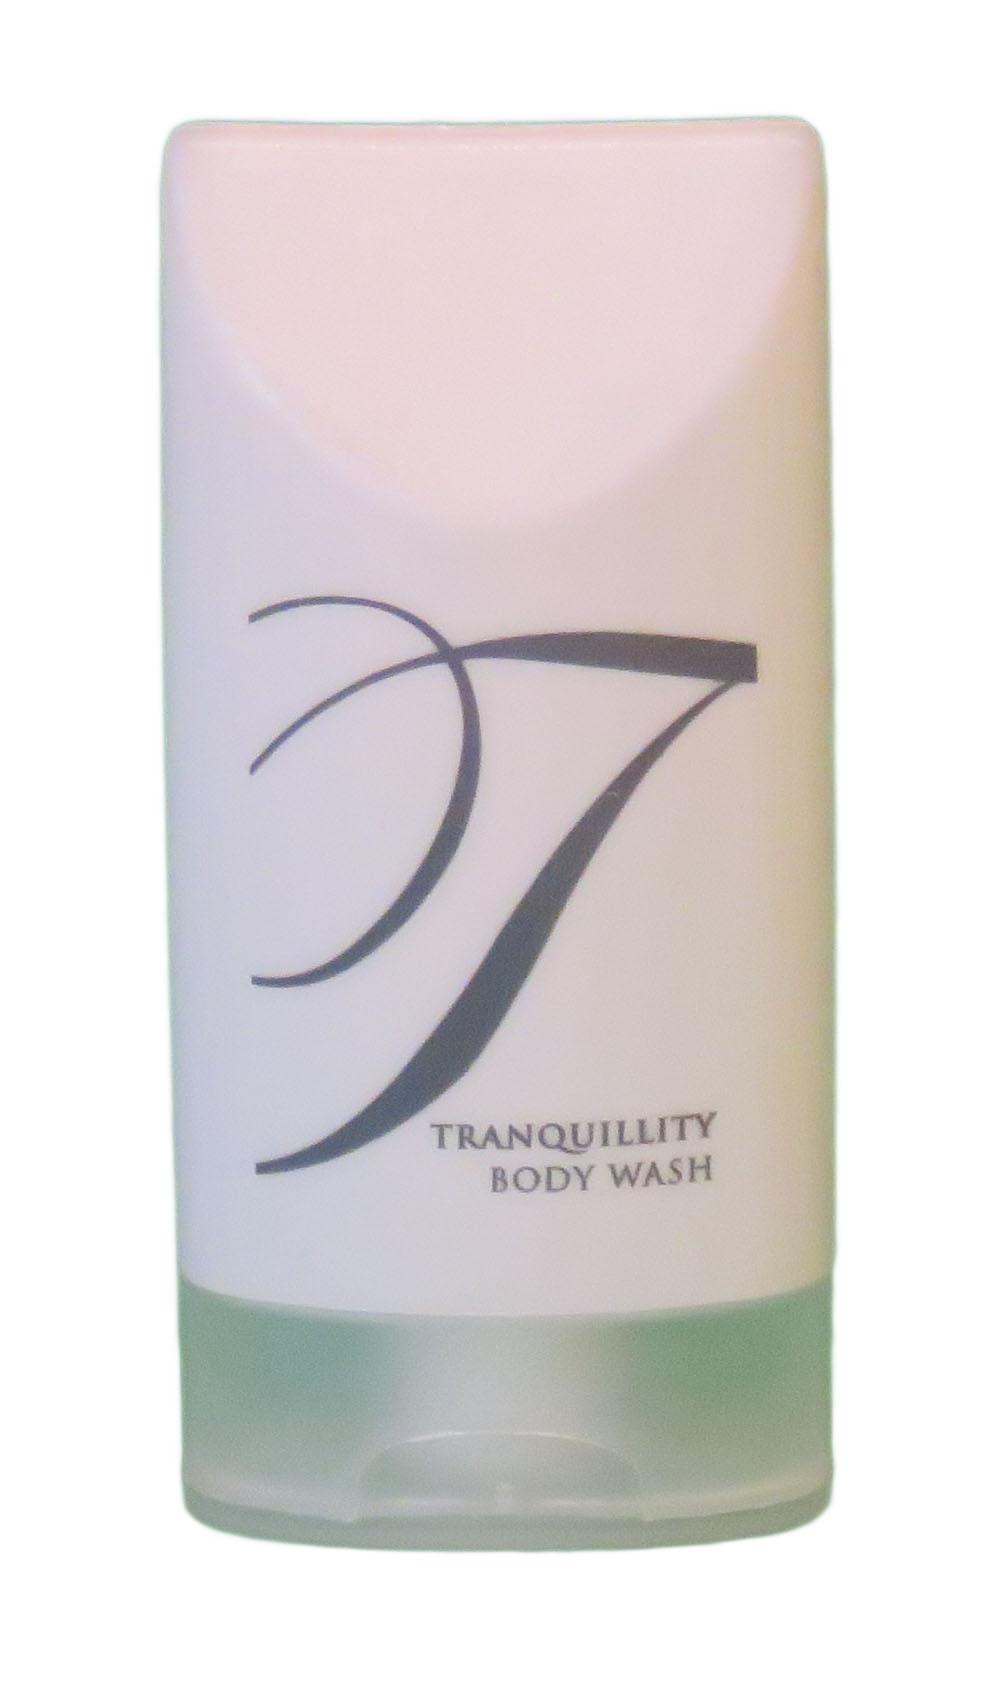 Tranquillity Hotel Body Wash